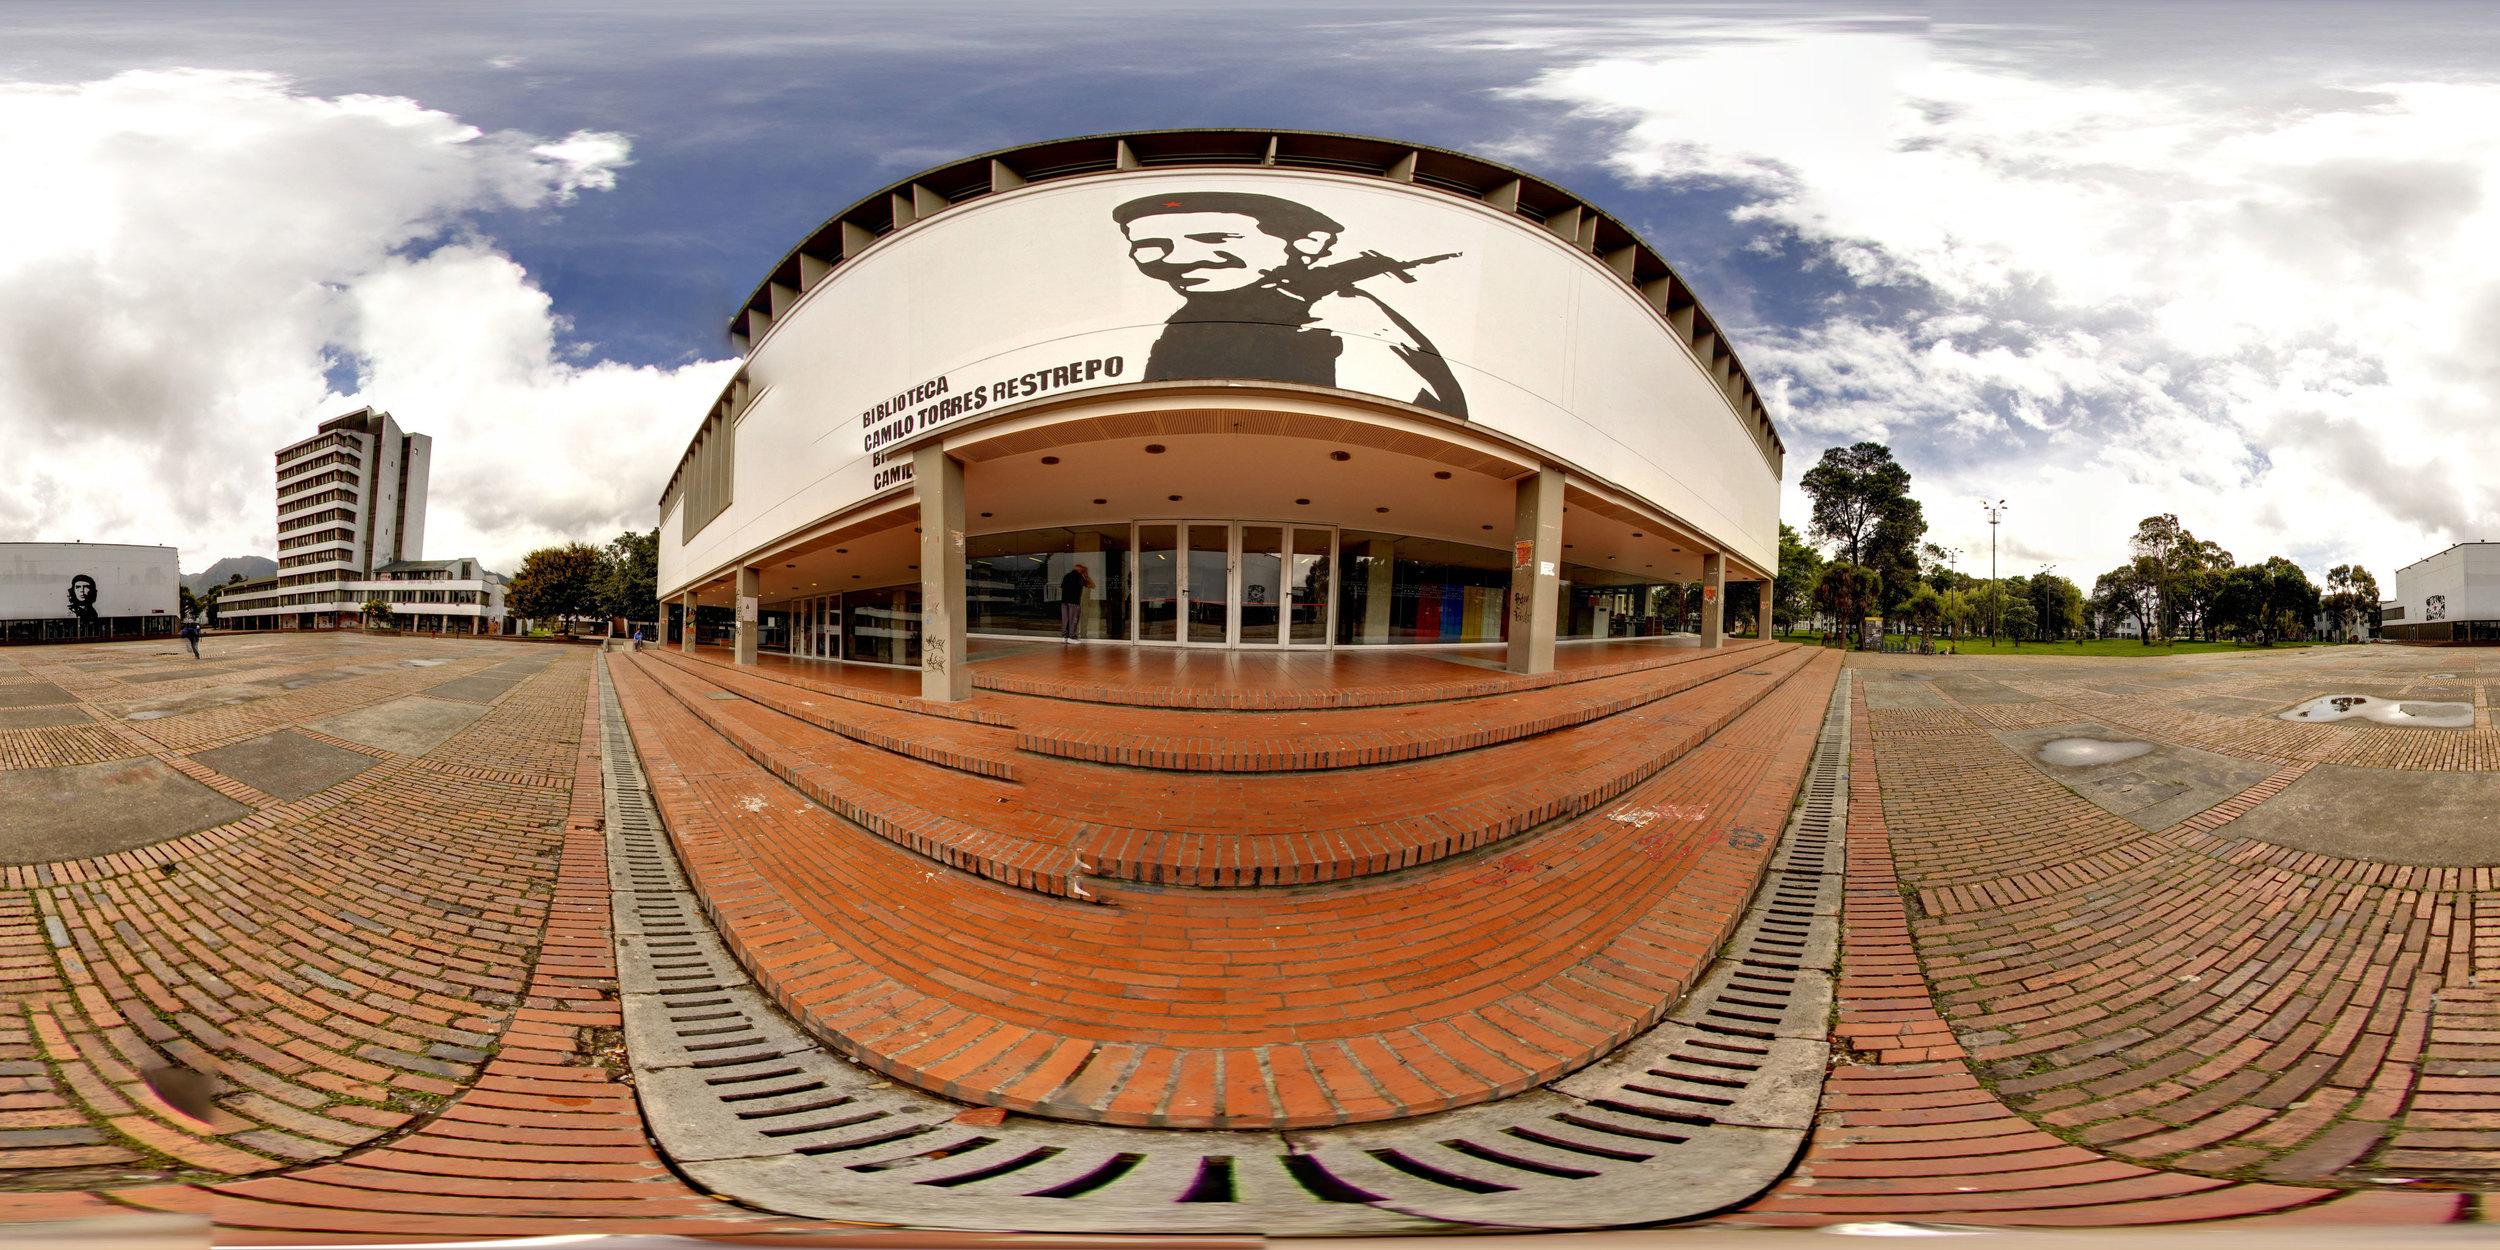 360° Camilo Torres at the National Universidad de Bogotá